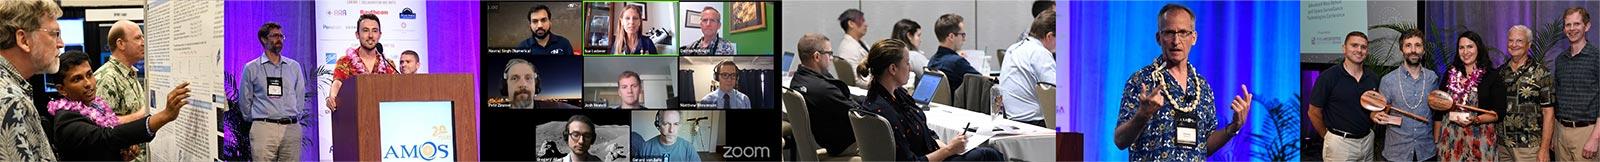 AMOS Conference Photos